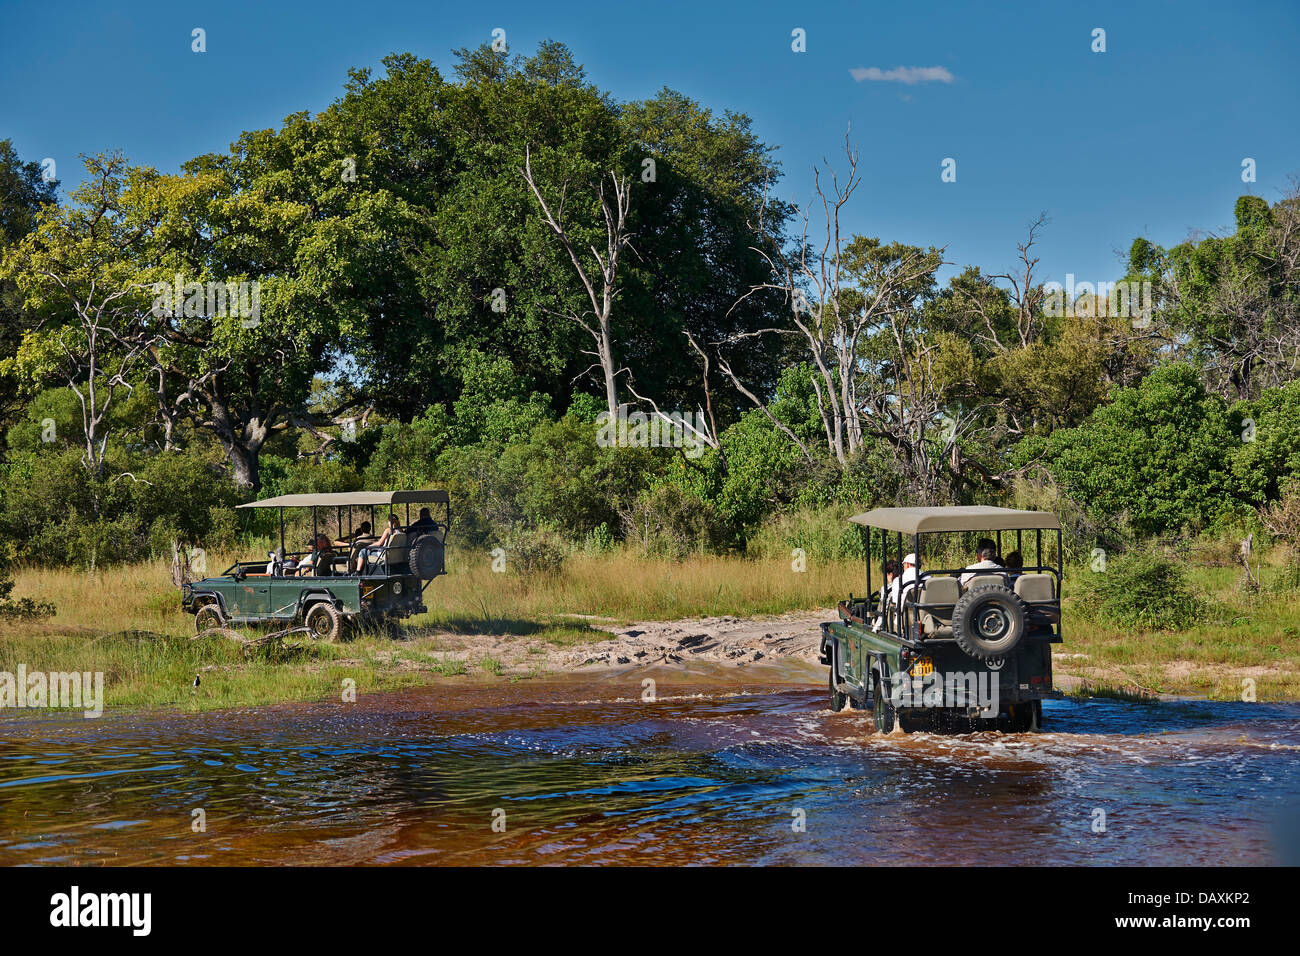 tourists in safari cars crossing water, Chitabe, Okavango Delta, Botswana, Africa - Stock Image